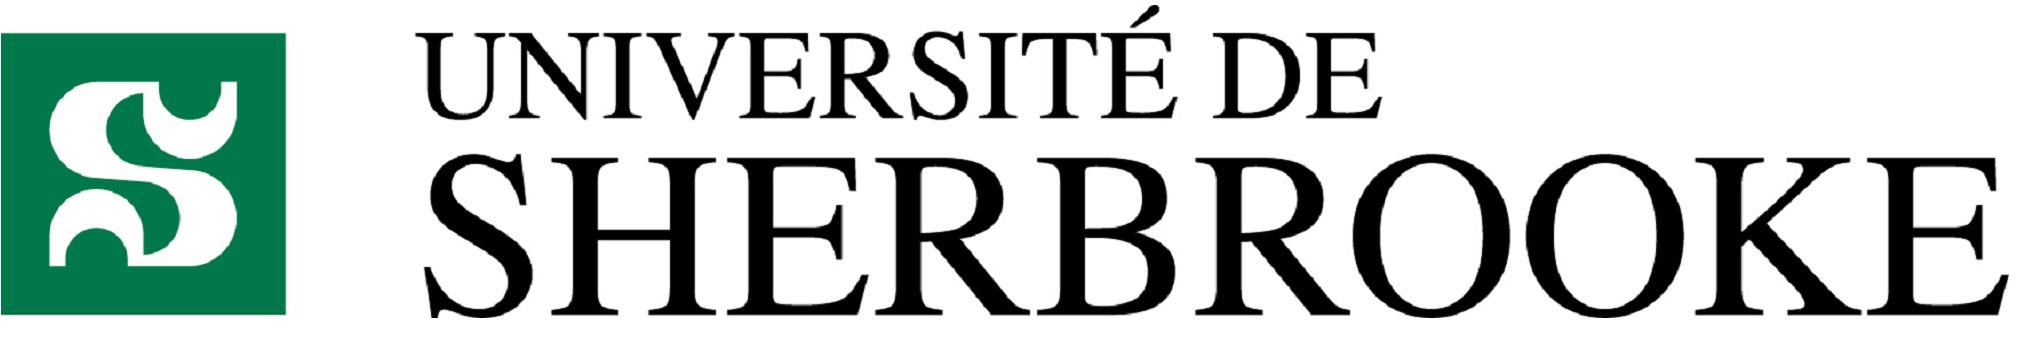 Universite de Sherbrooke logo